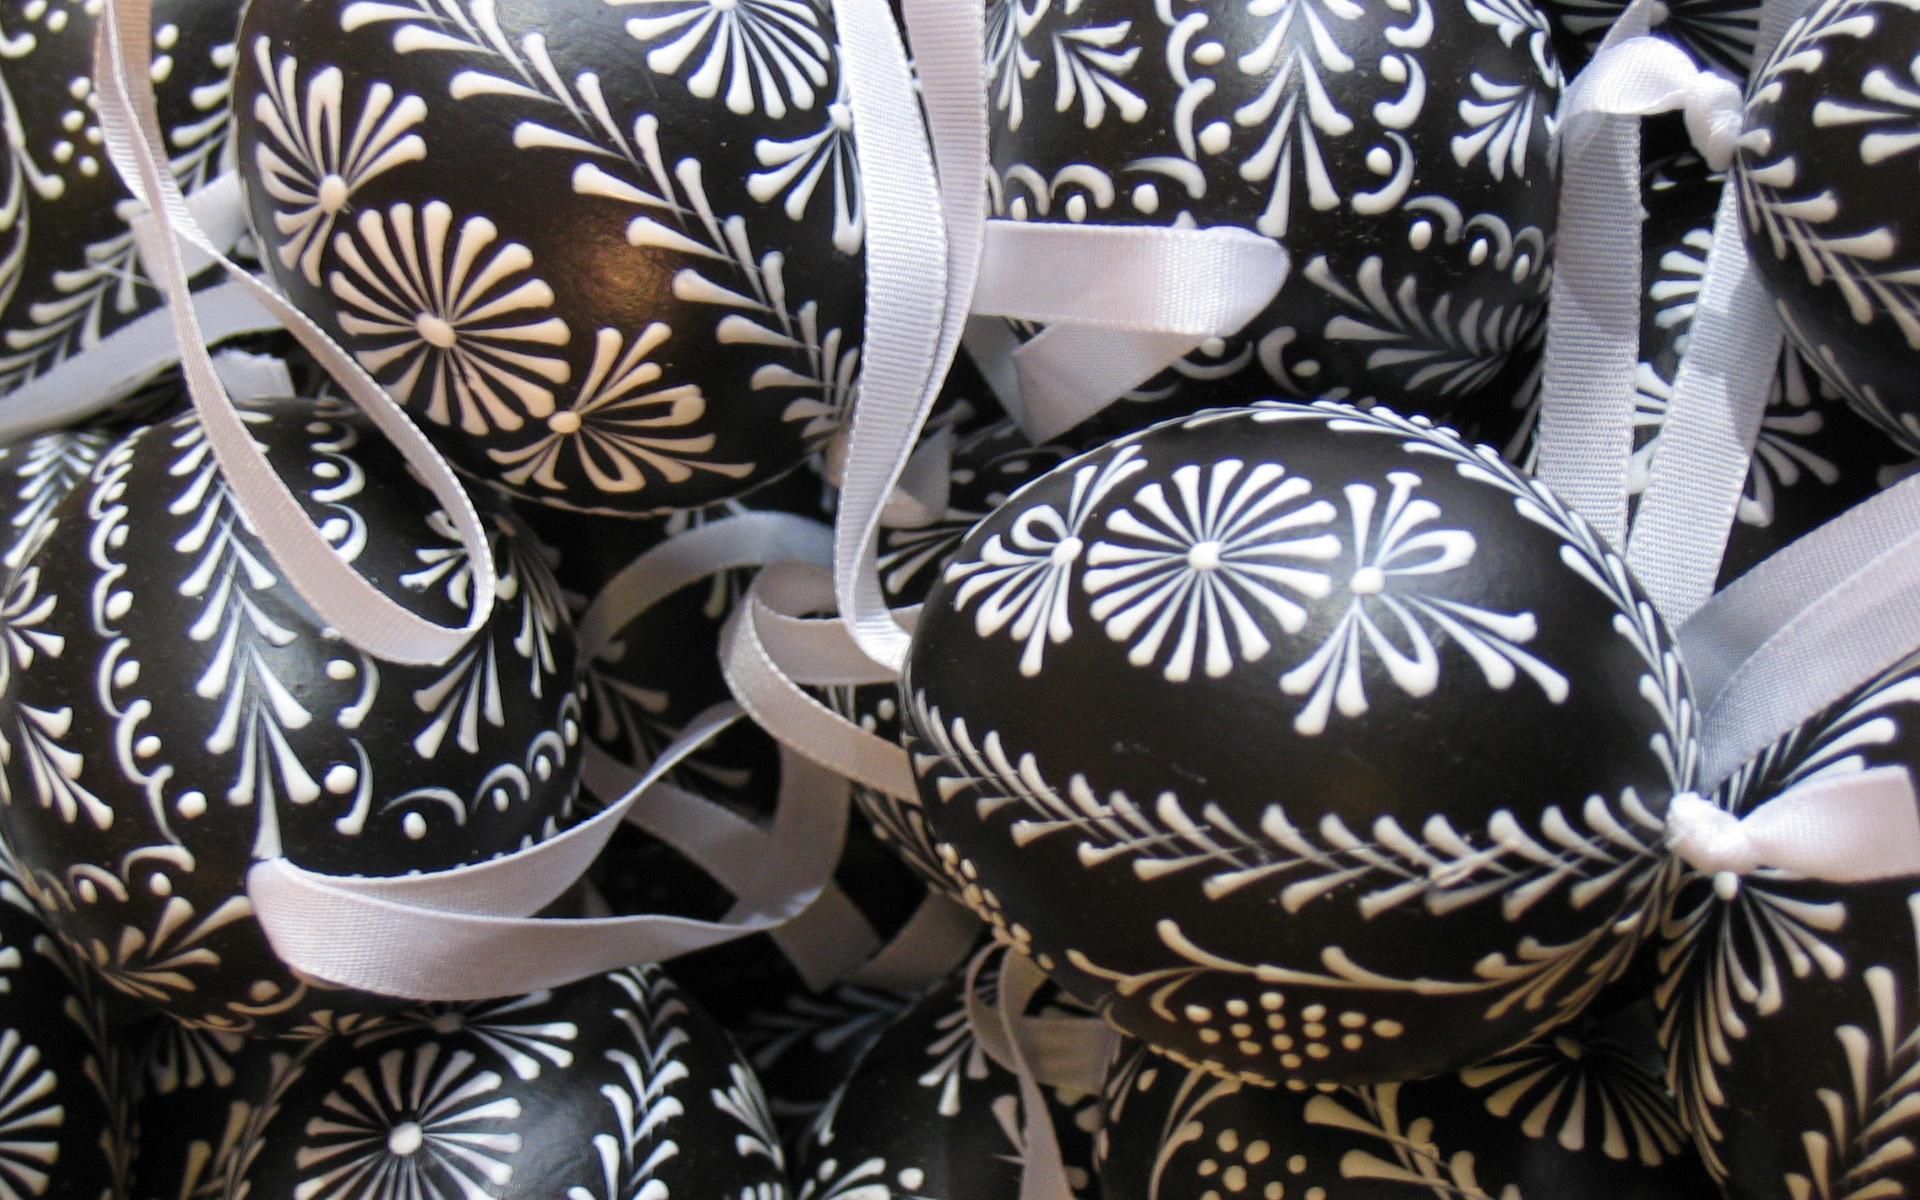 13881 descargar fondo de pantalla Vacaciones, Fondo, Huevos, Pascua: protectores de pantalla e imágenes gratis